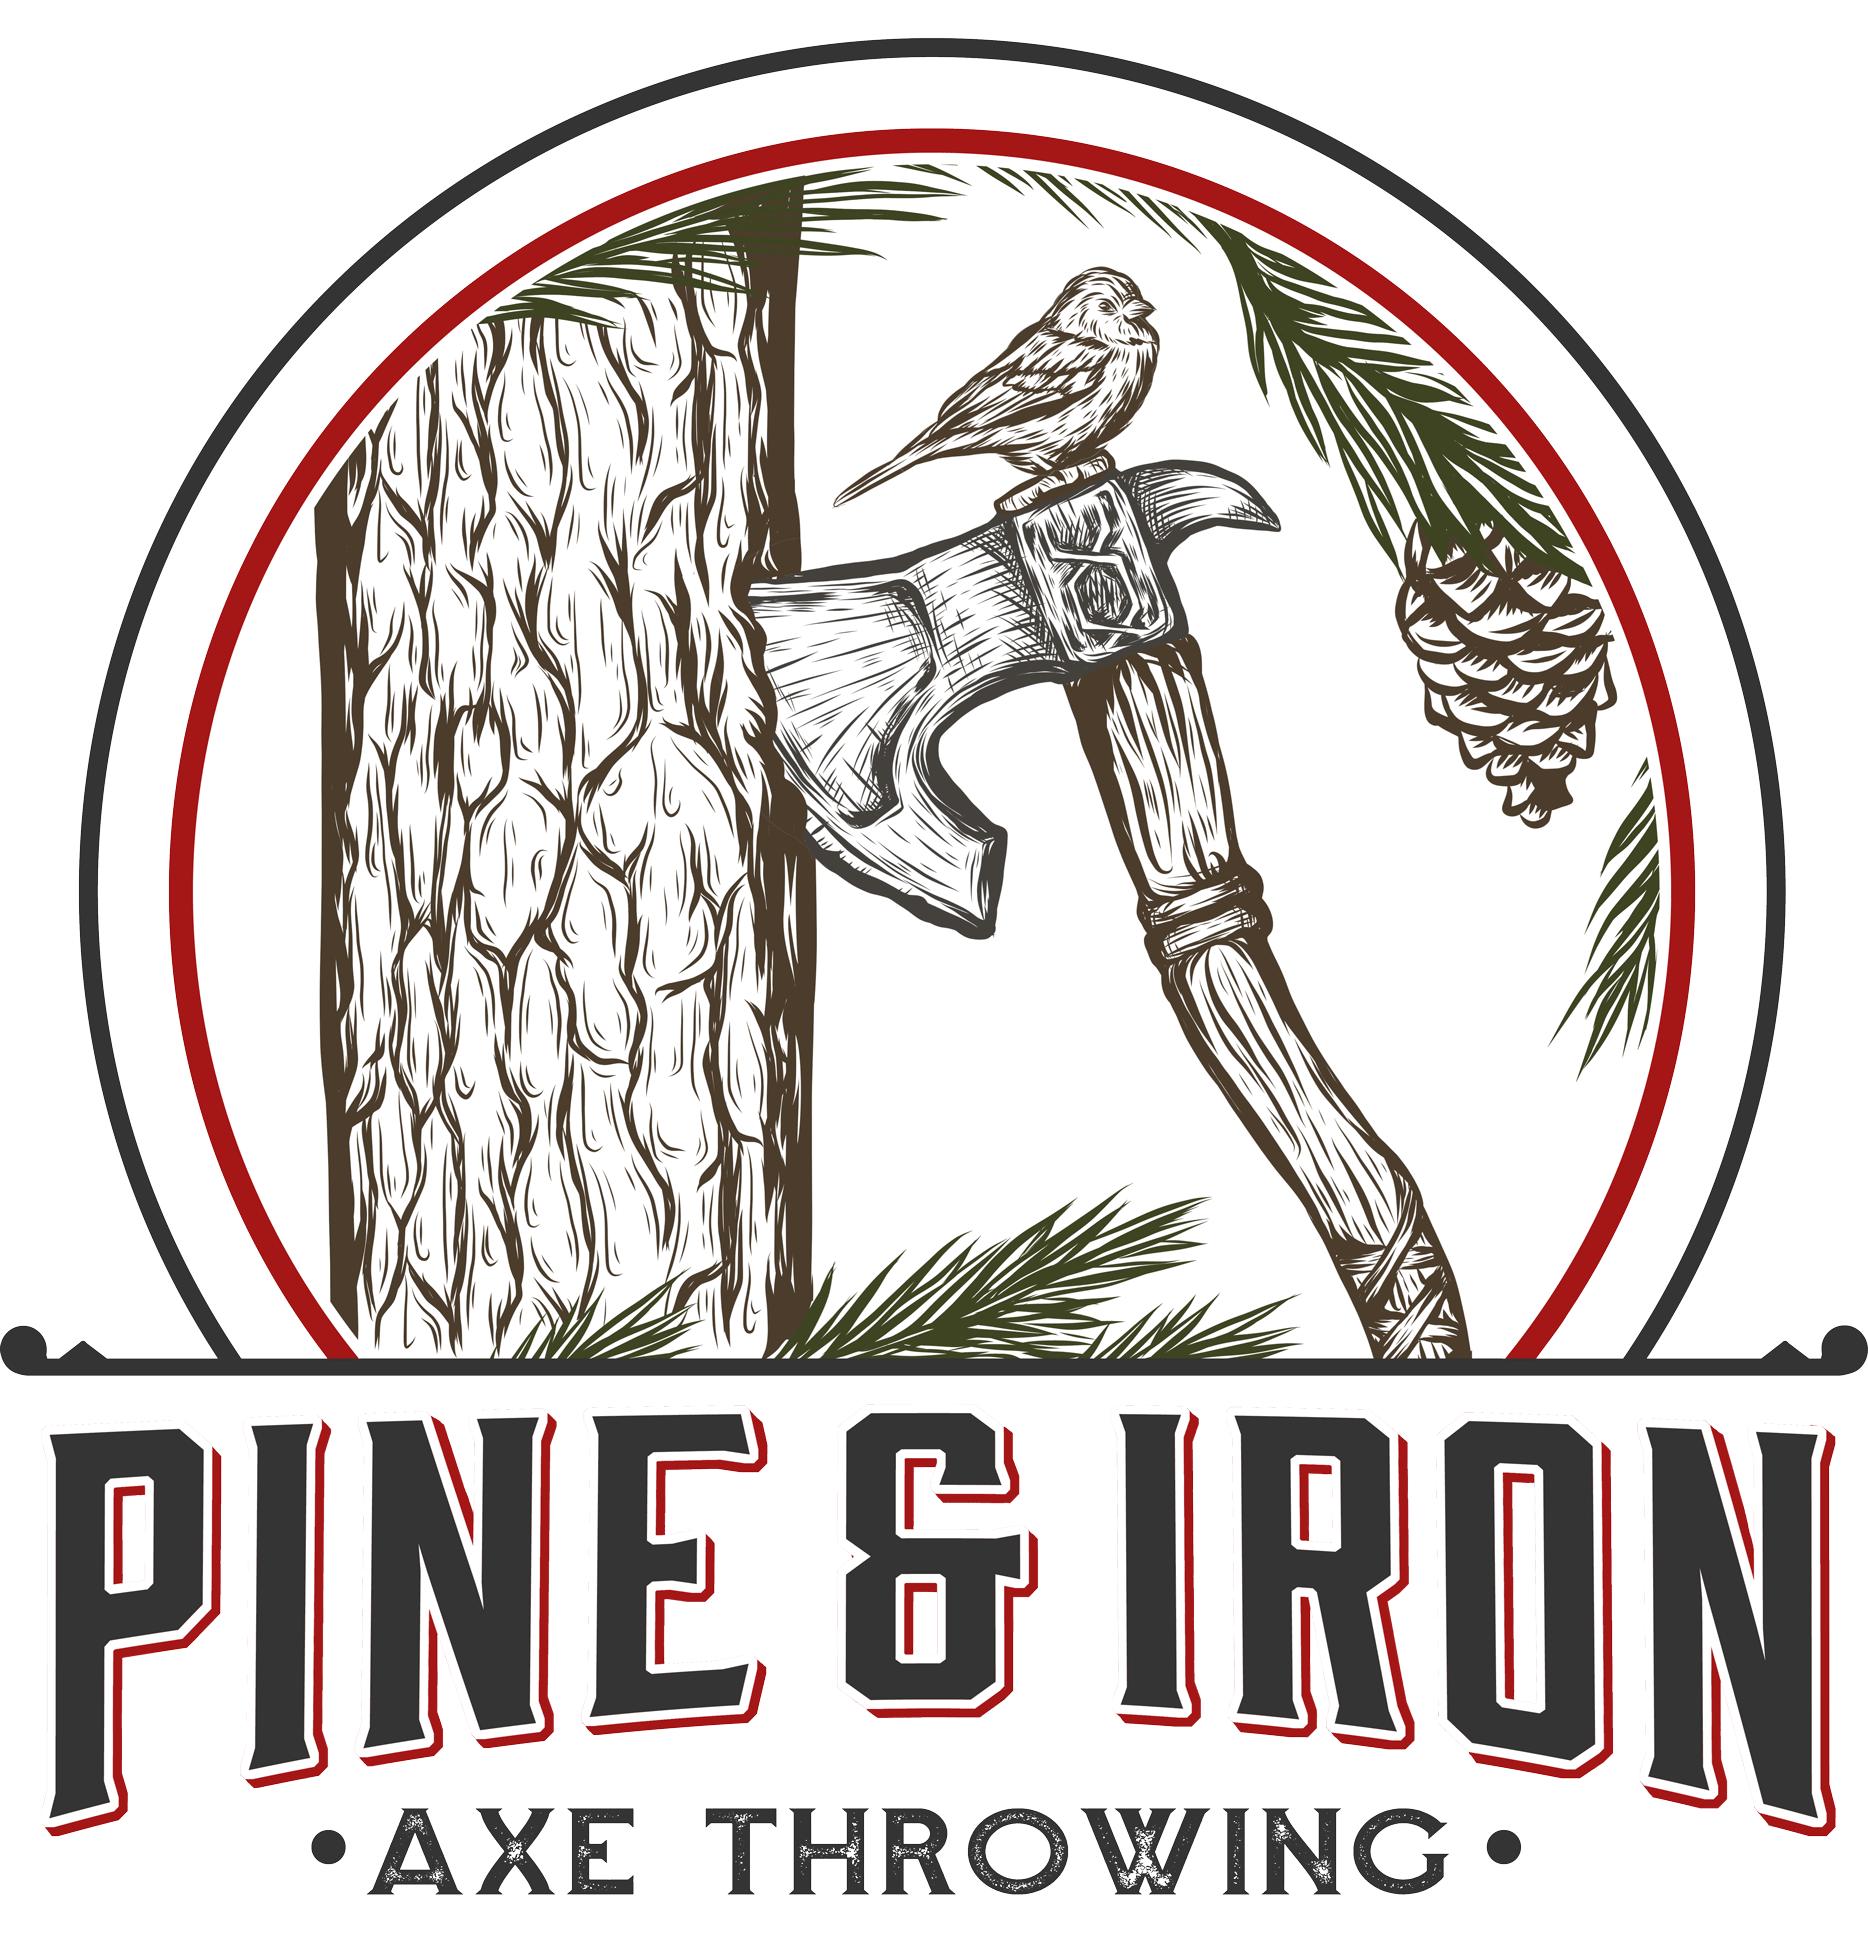 pine_and_iron_axe_throwing_logo_main